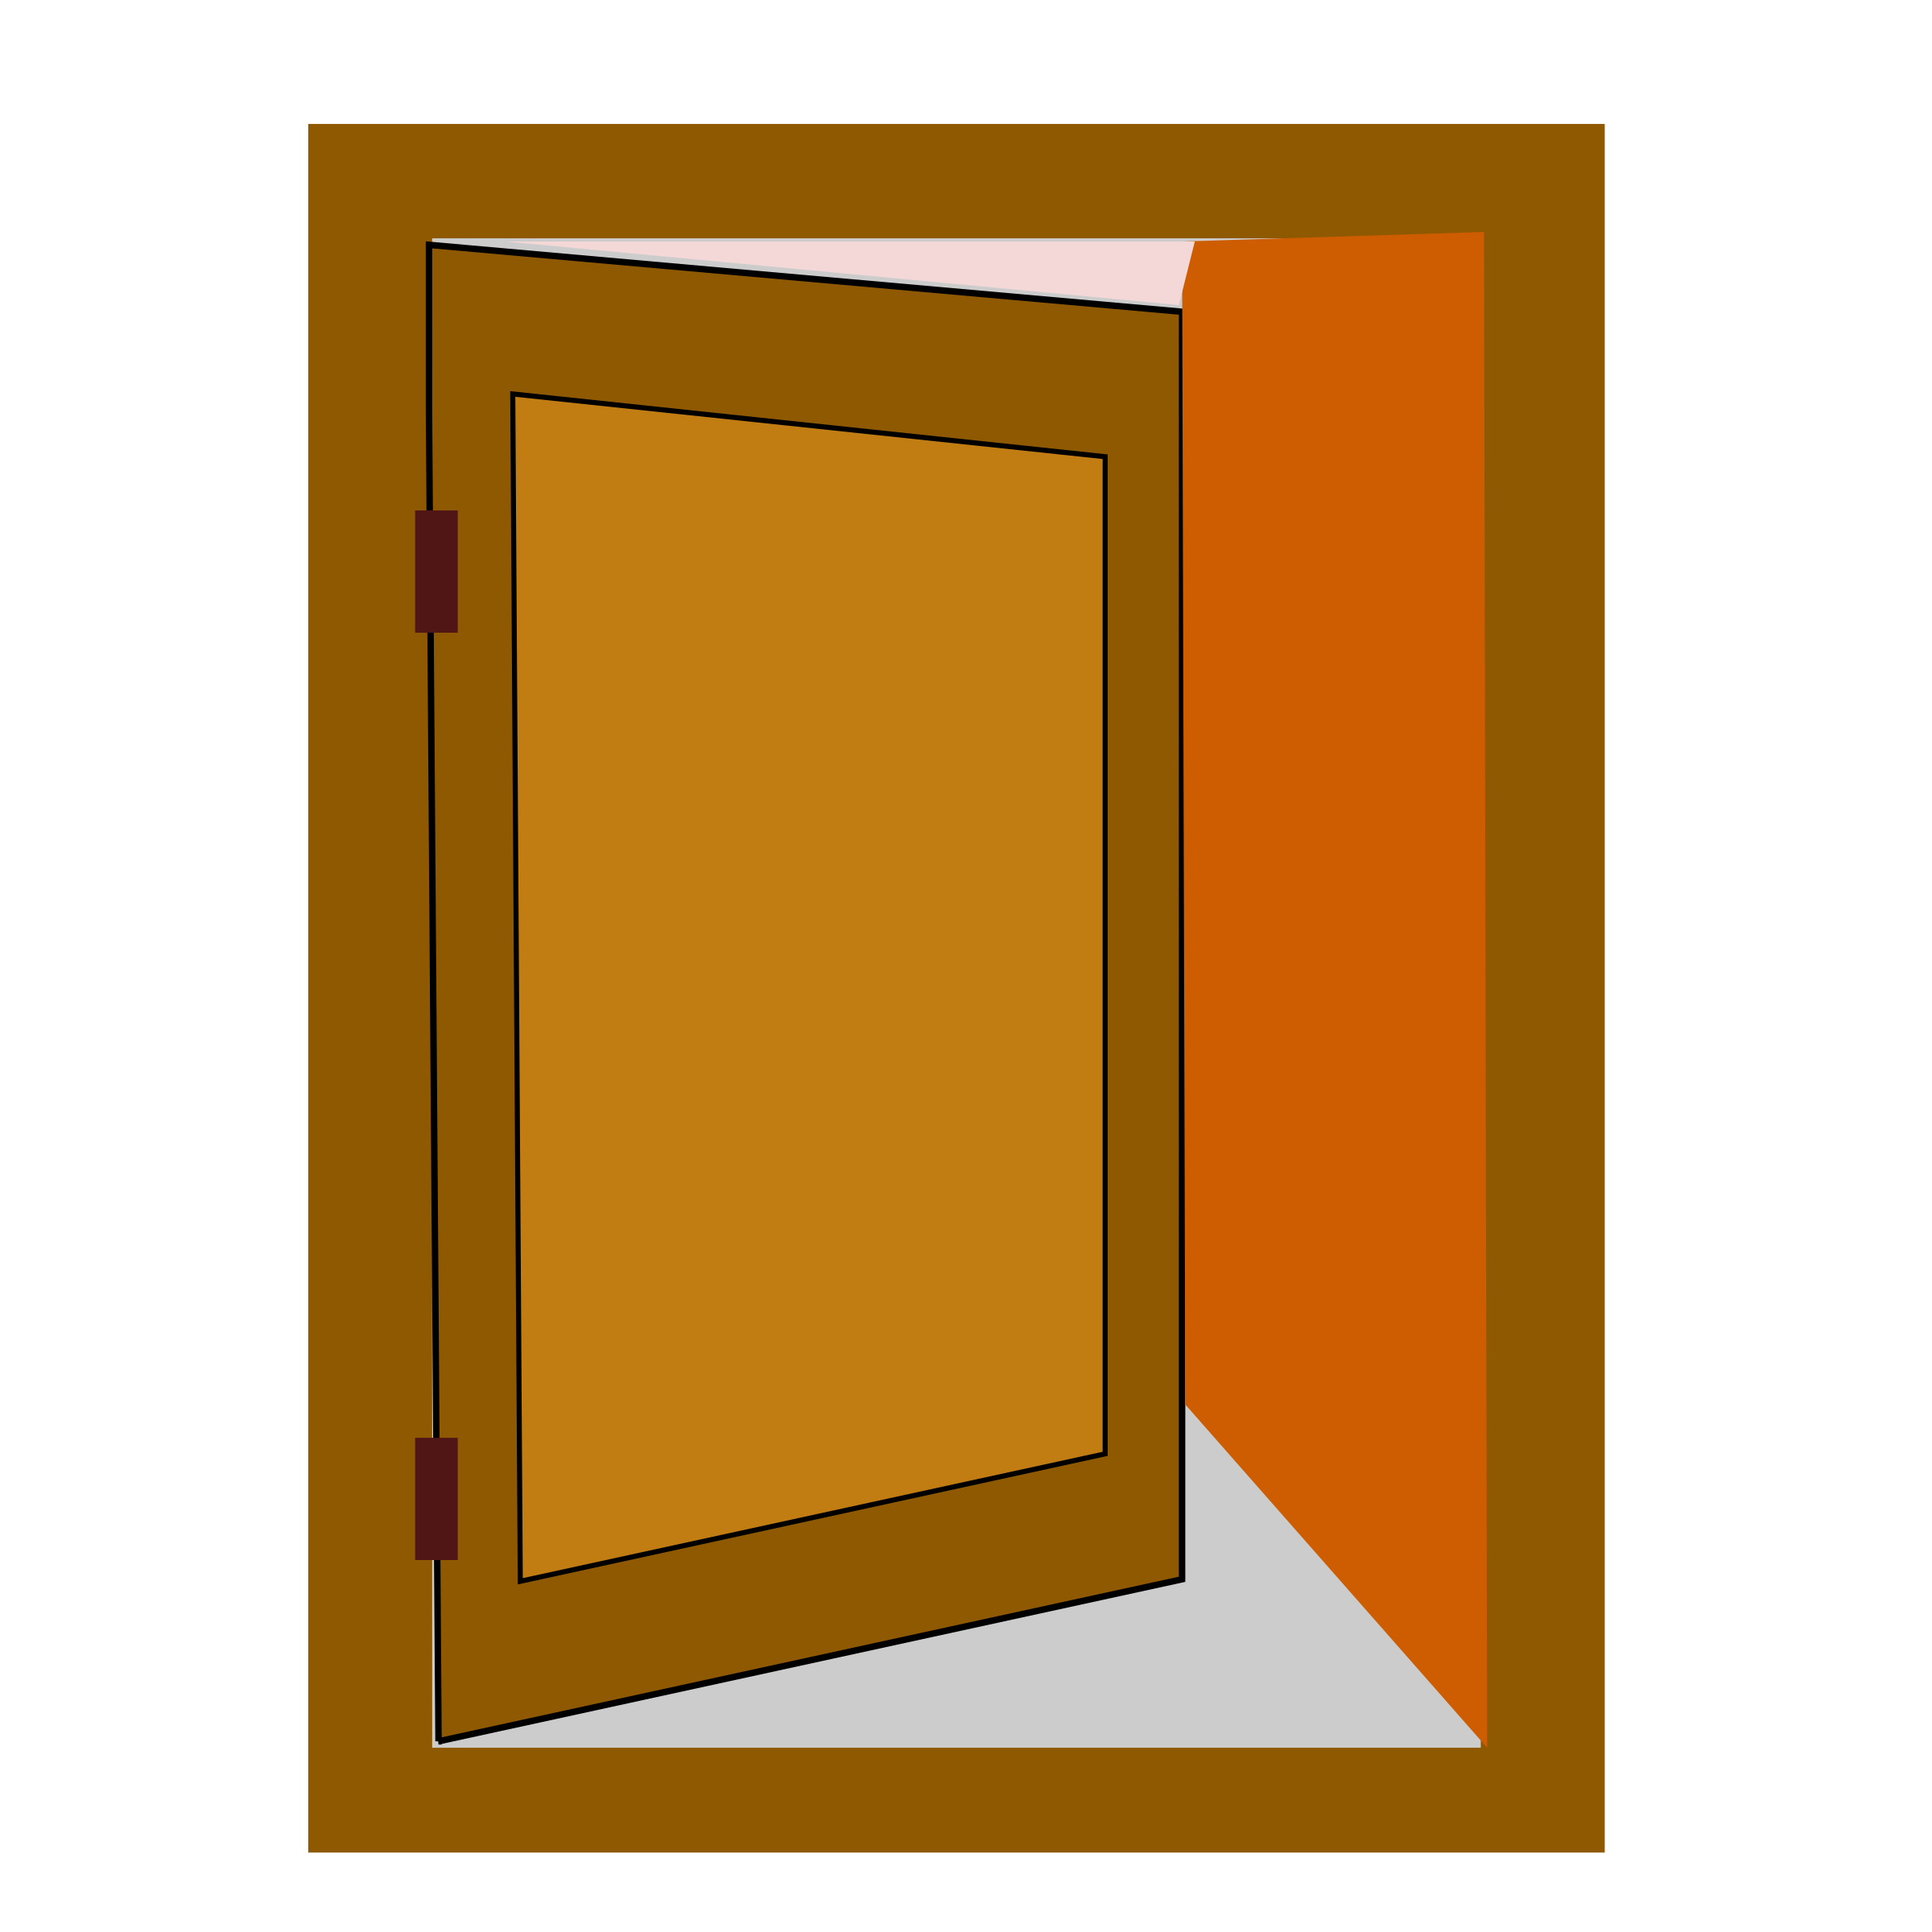 Clipart door animated. Images free download best